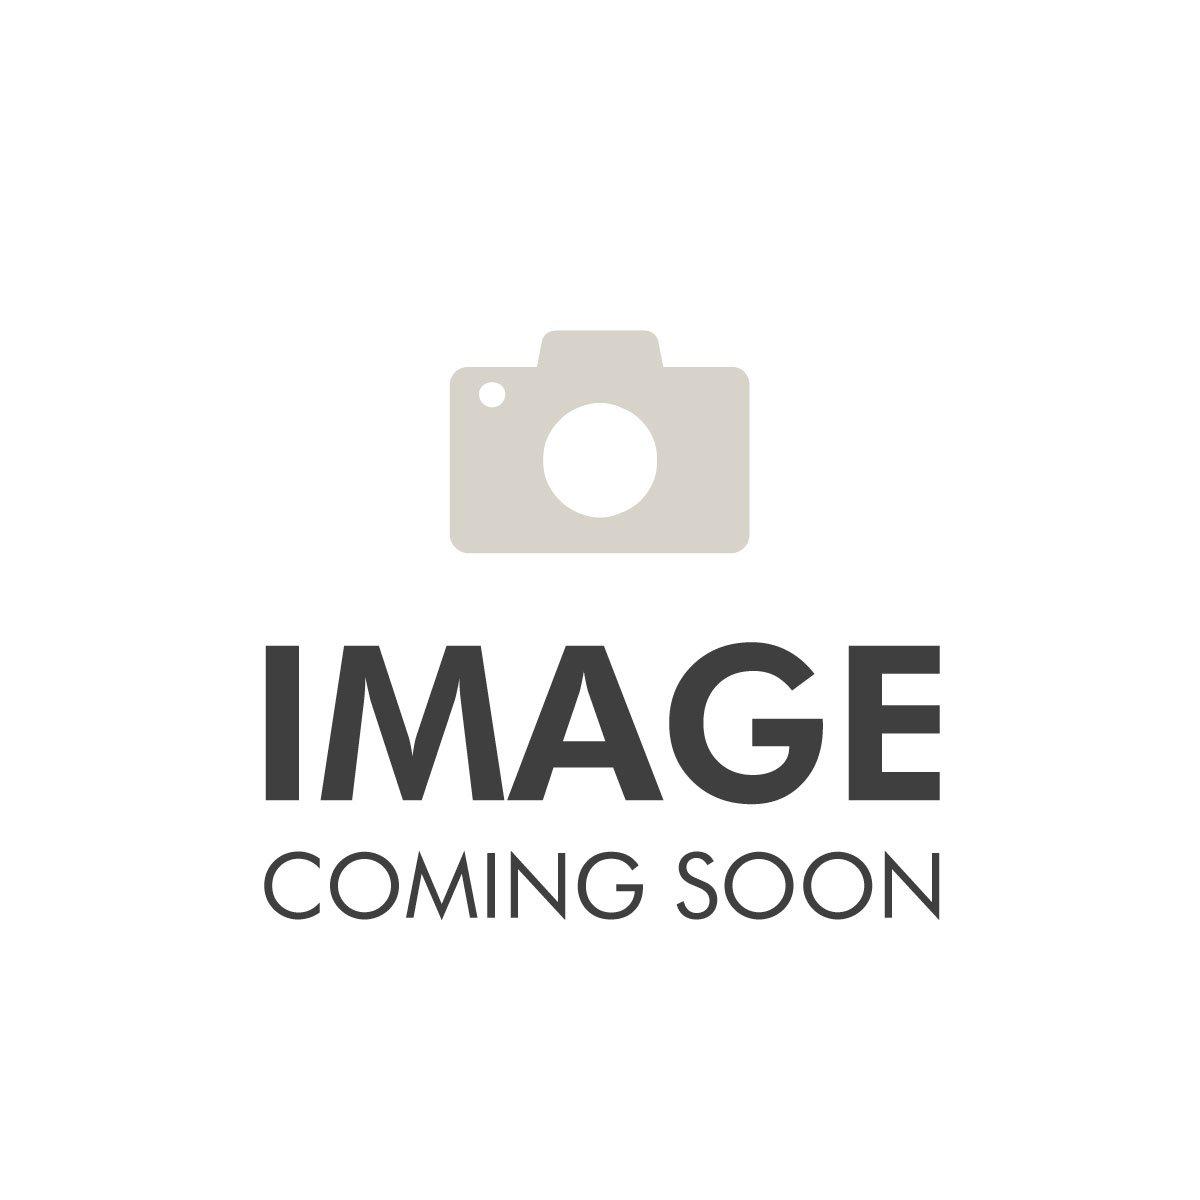 Clarins Super Restorative Night Cream 50ml (for Dry Skin)